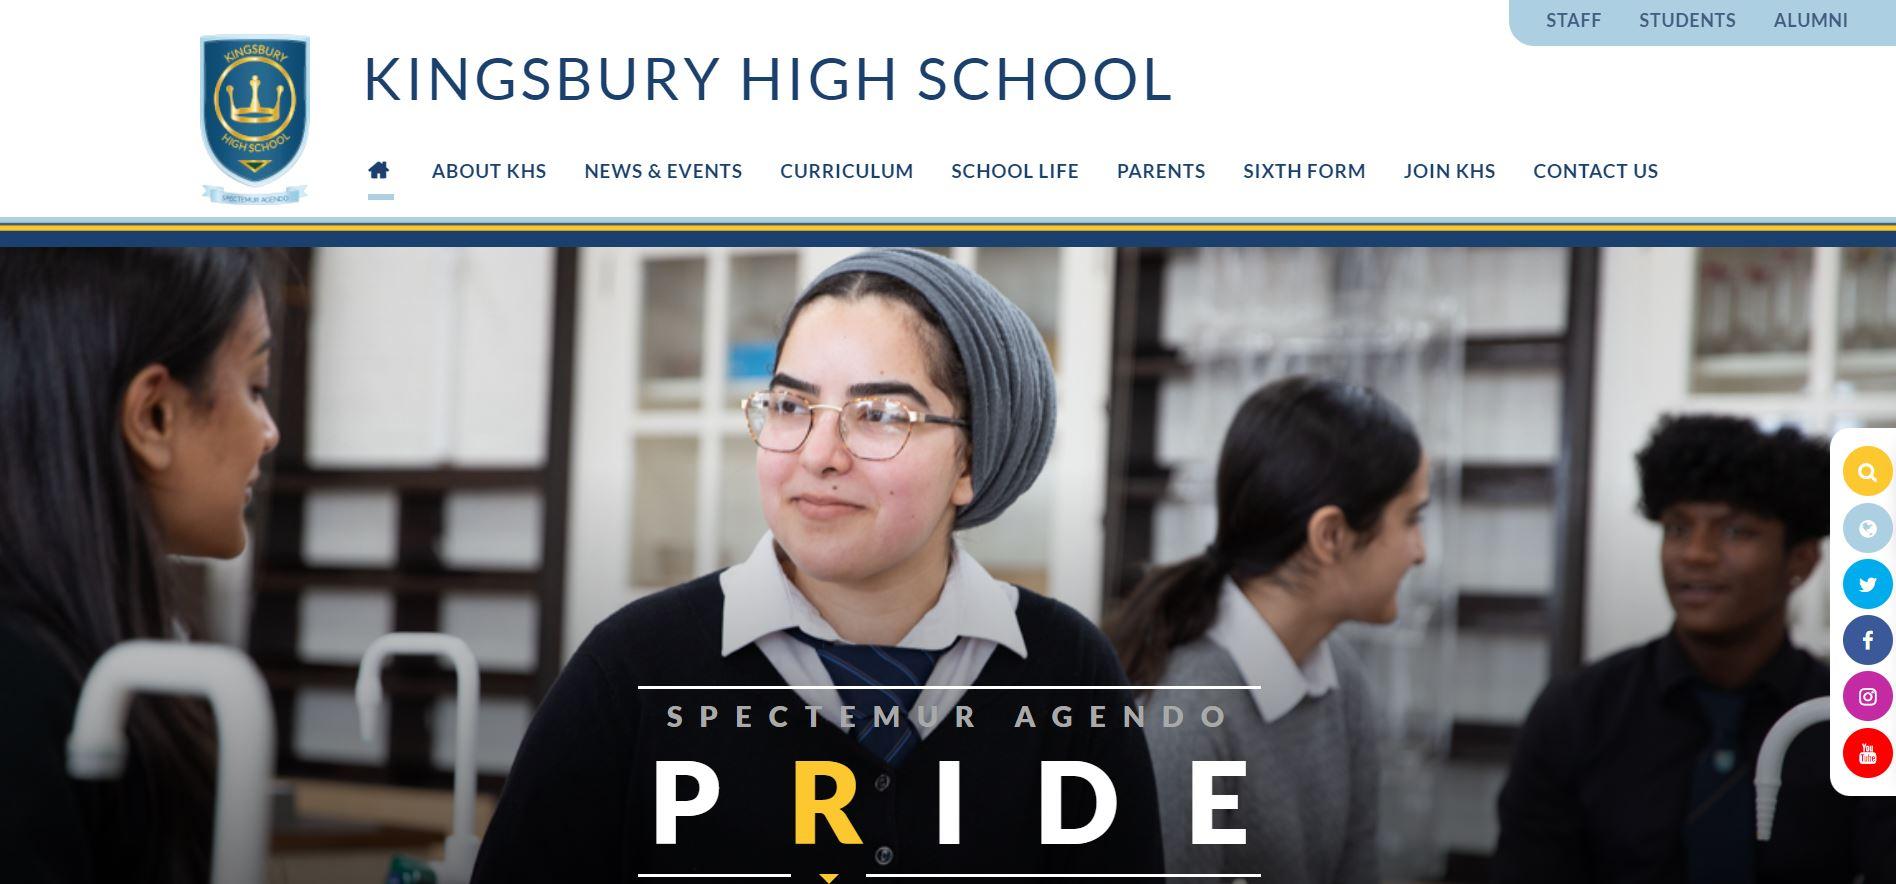 Kingsburry High School